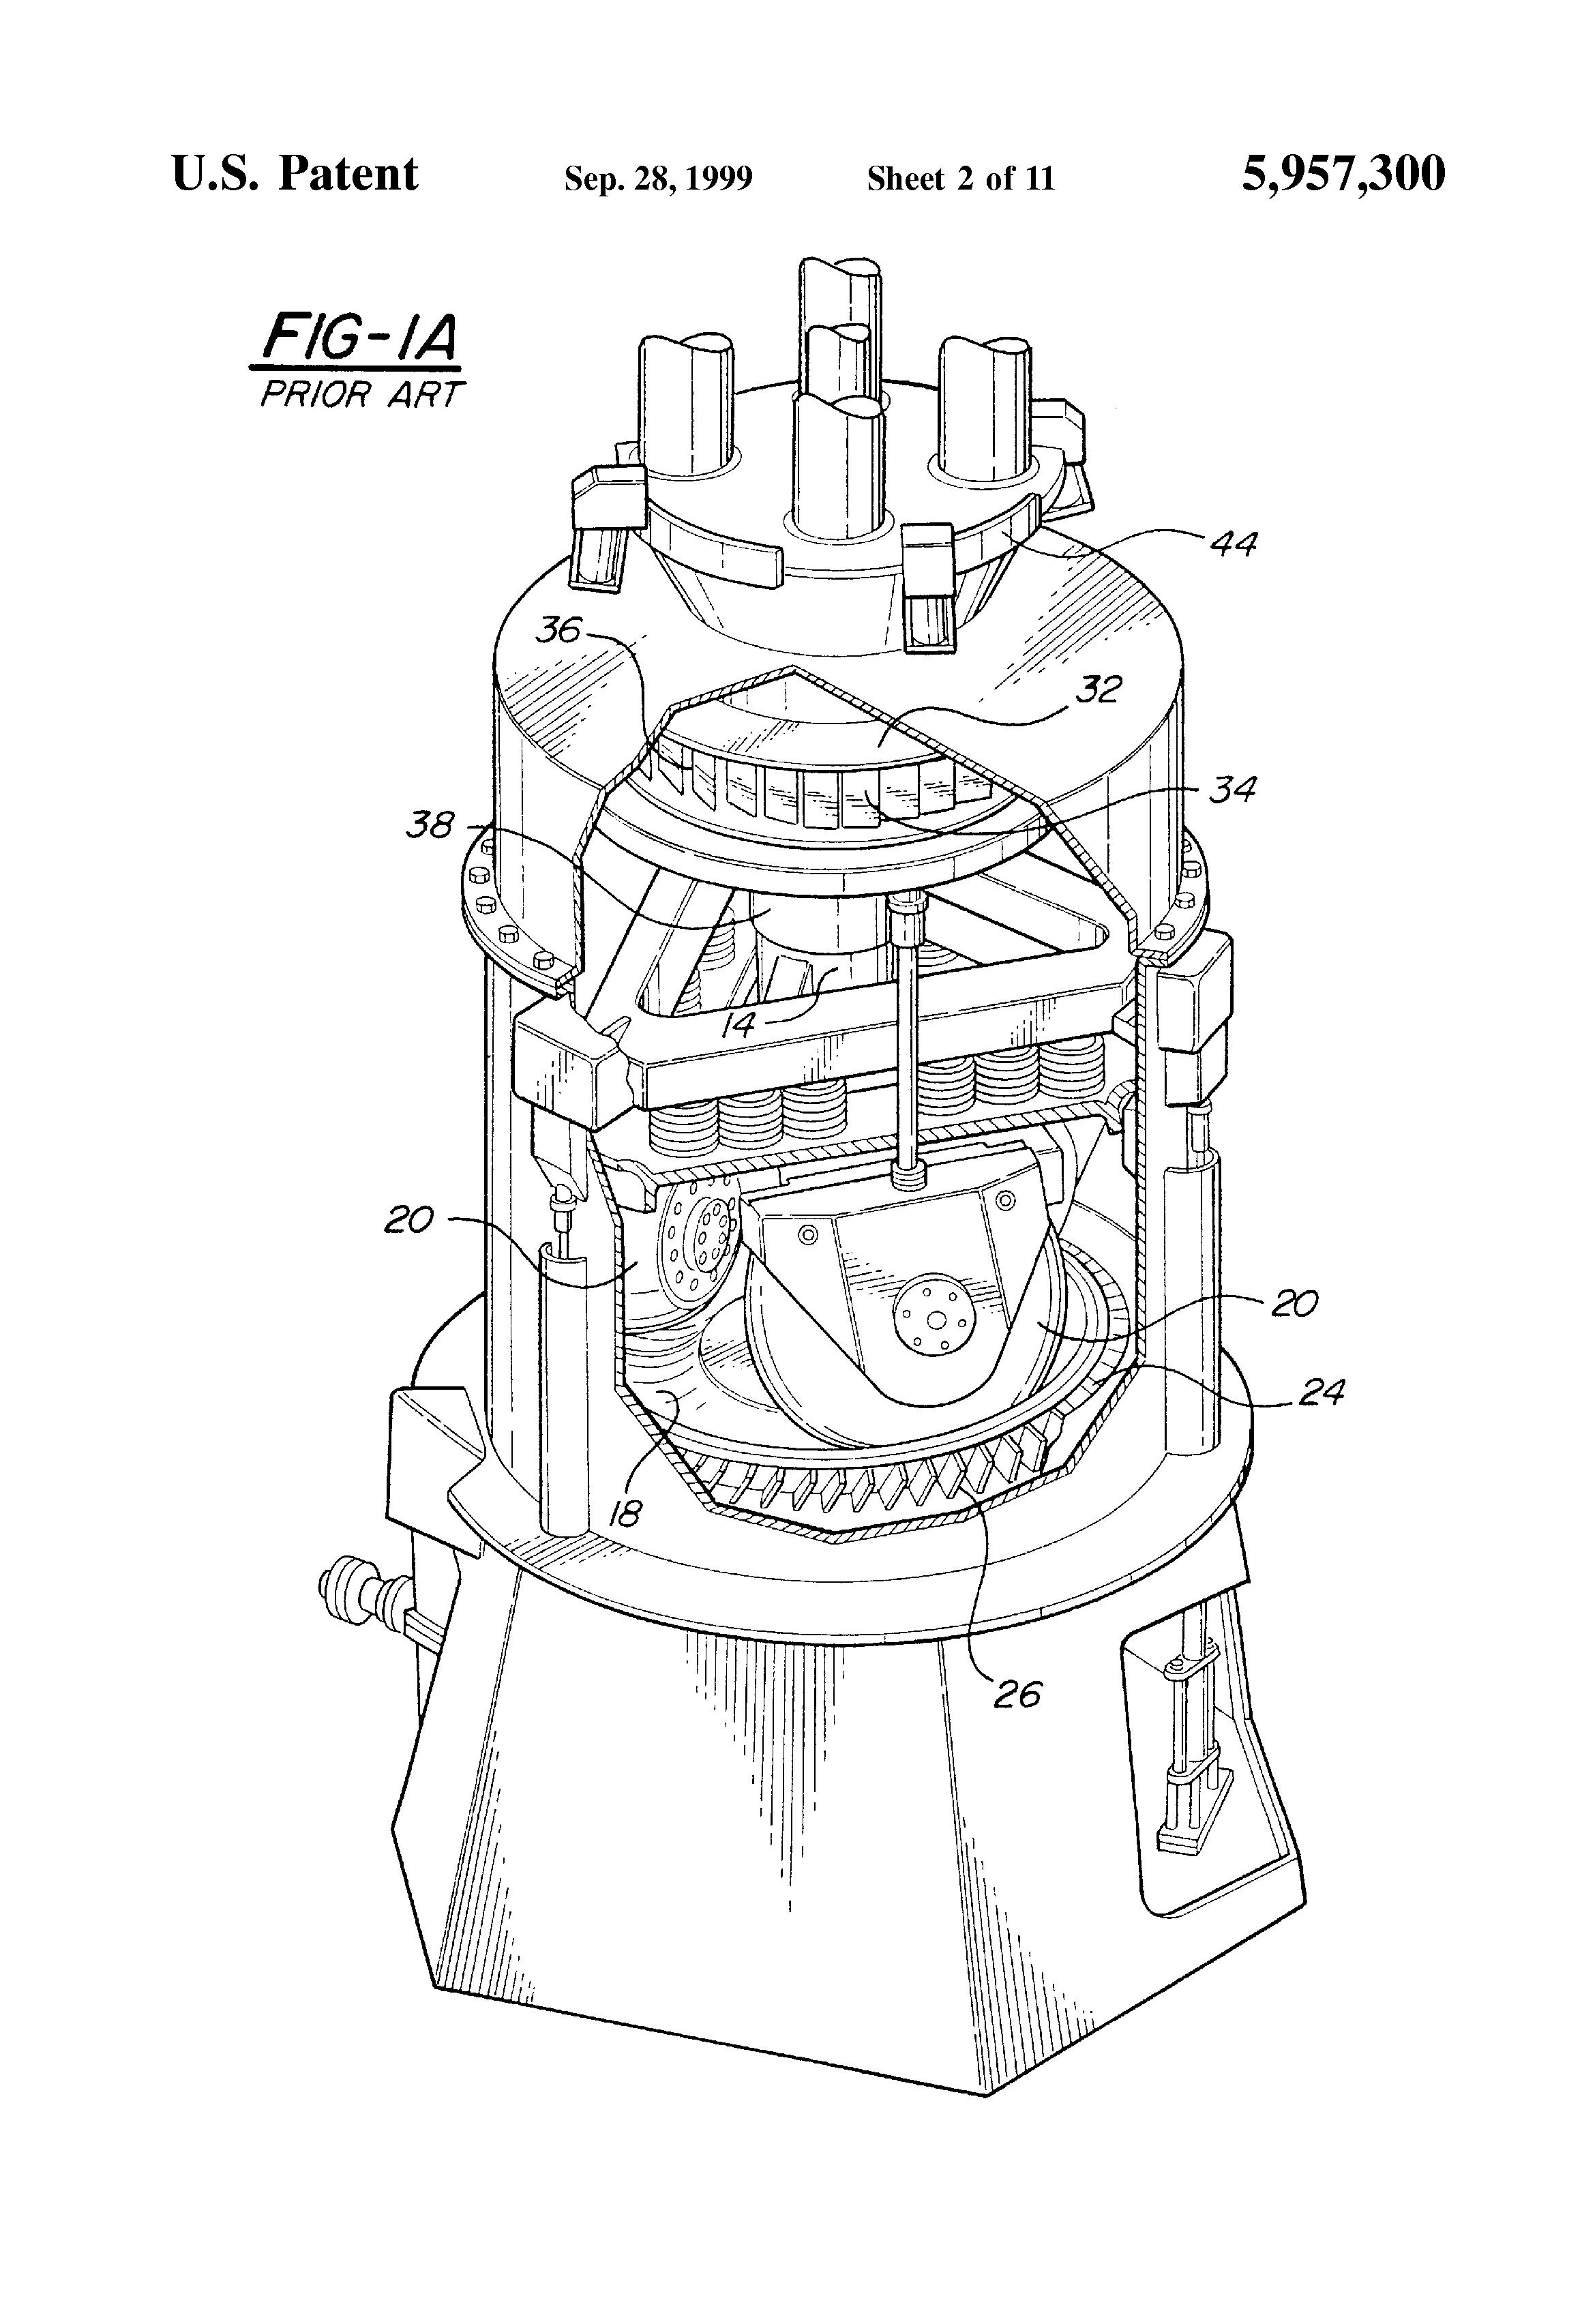 zx6r j1 wiring diagram vn davidforlife de KLR 650 Parts Diagram zx6r j1 wiring diagram images gallery patente us5957300 classifier vane for coal mills patentes rh tl